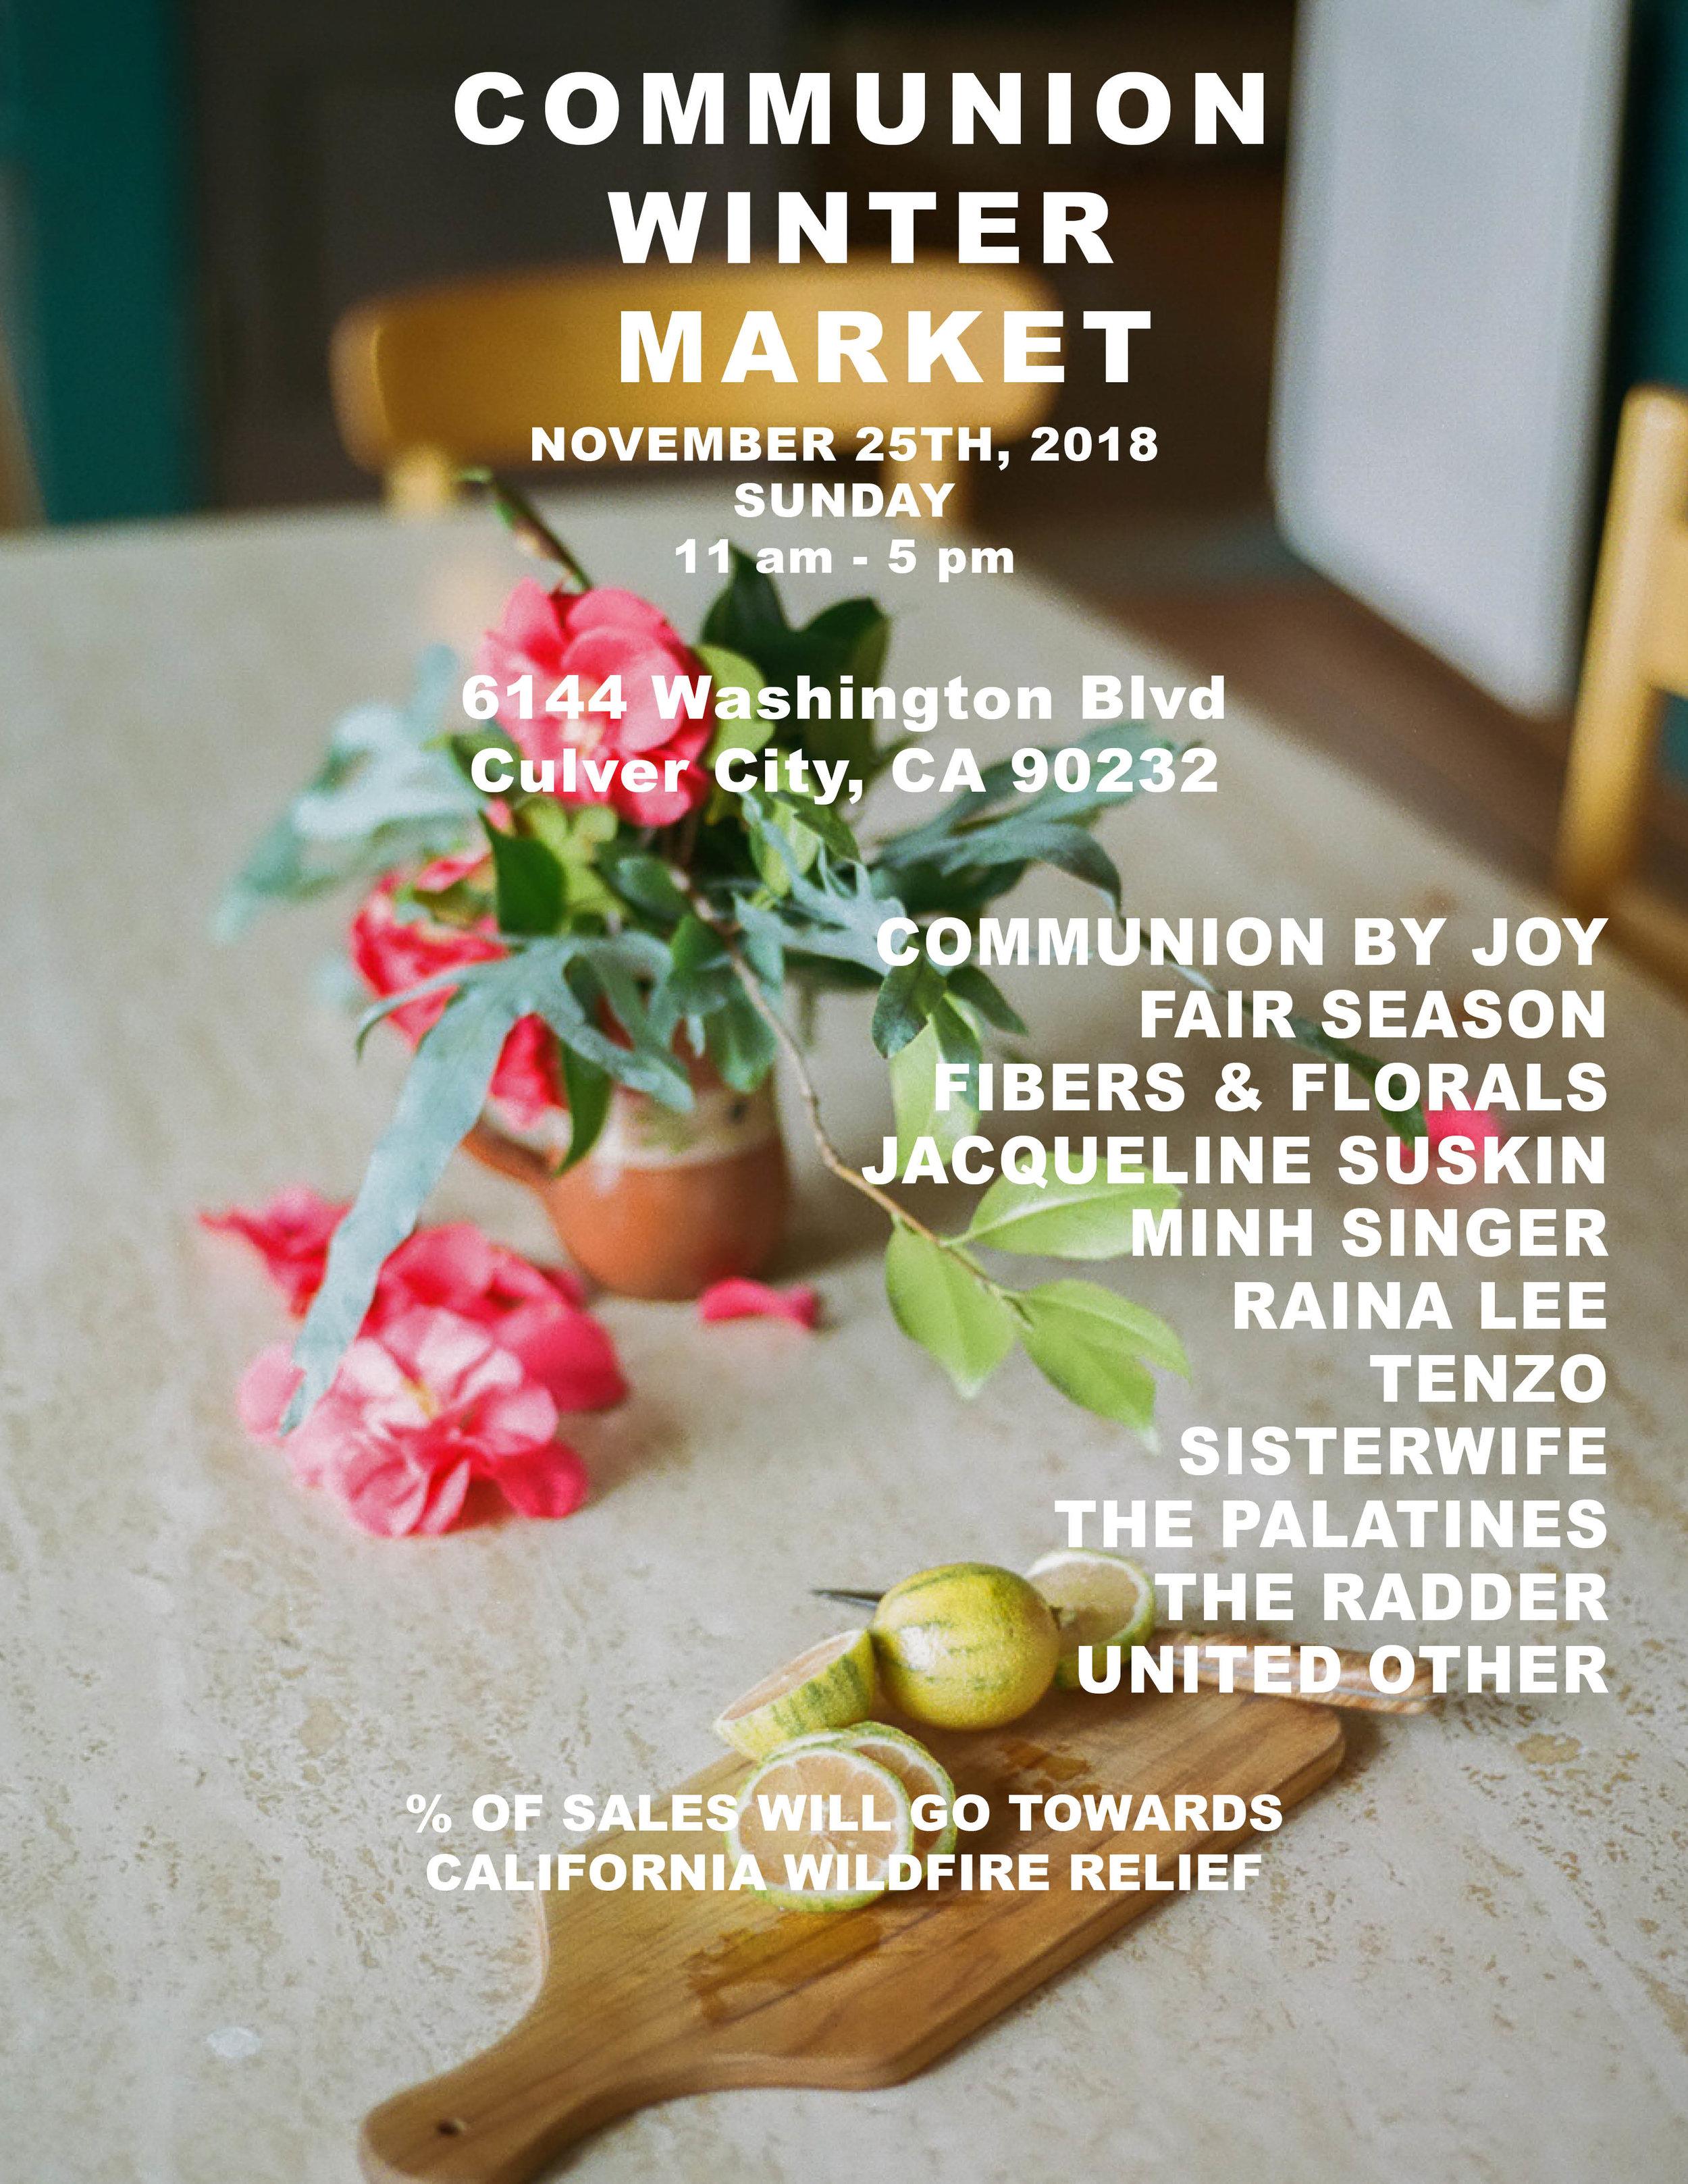 communion winter market 18 - vendor flyer.jpg